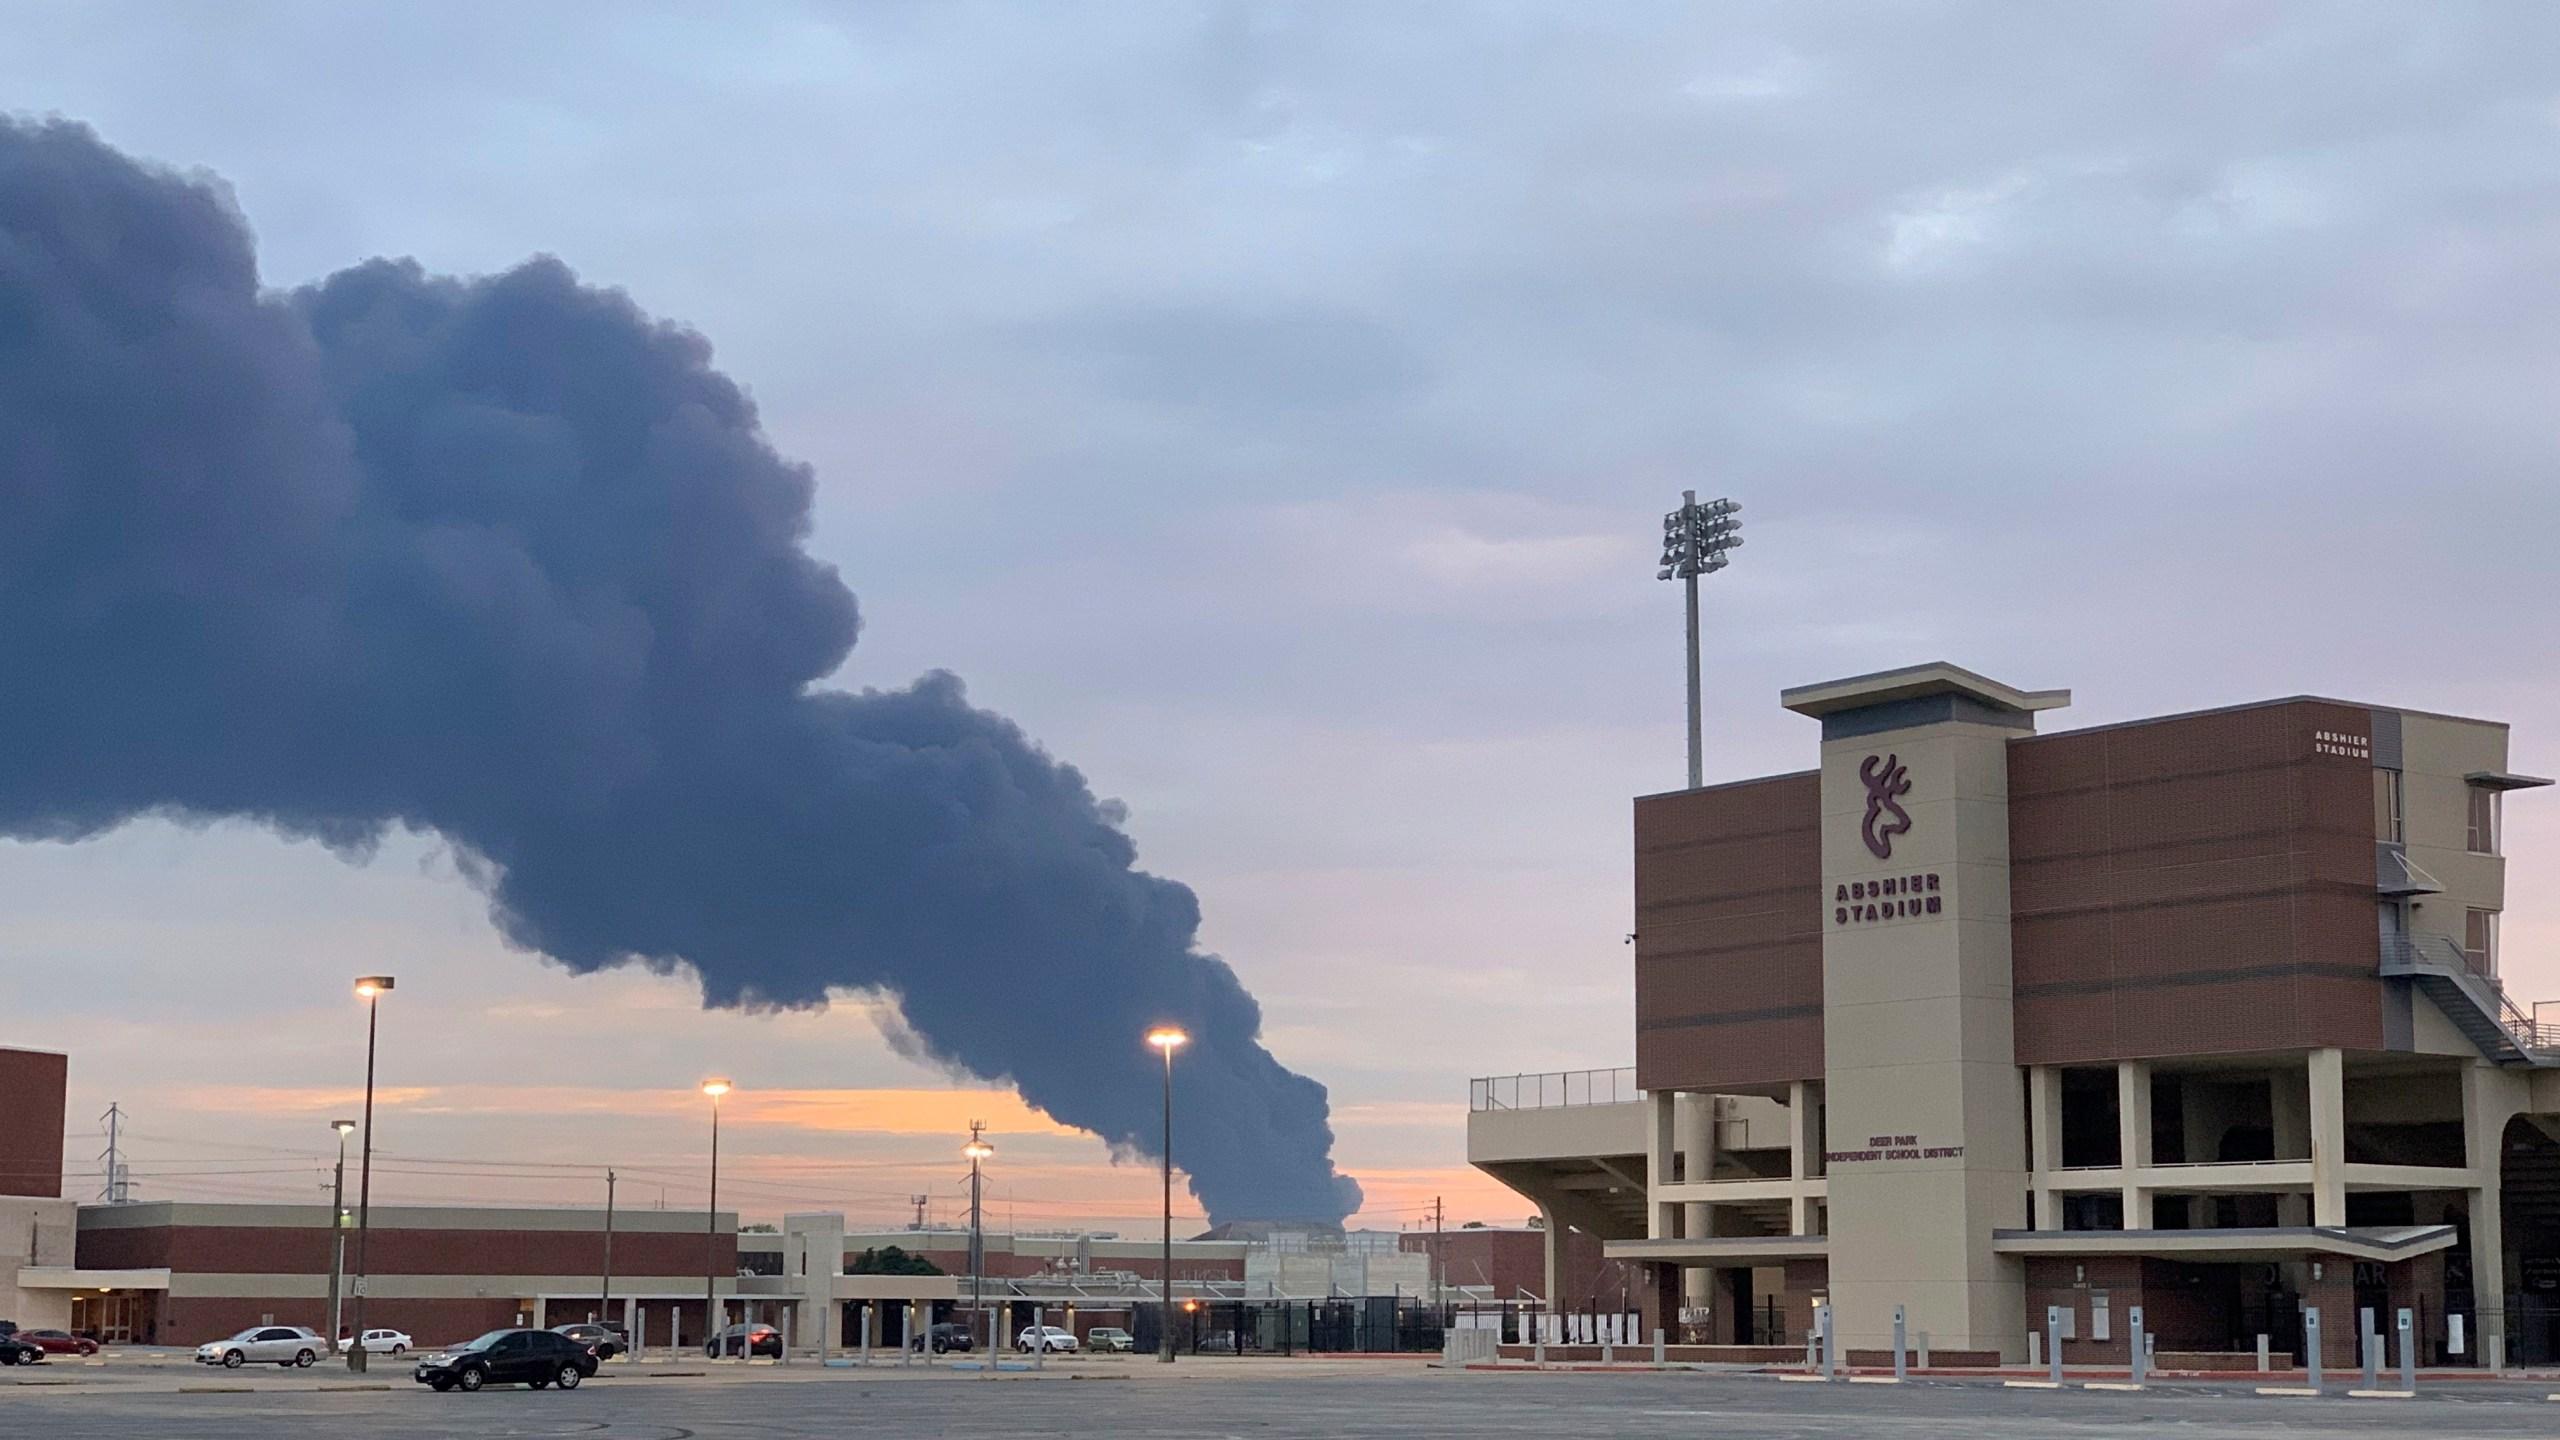 Petrochemical_Fire_Texas_95652-159532.jpg80379766